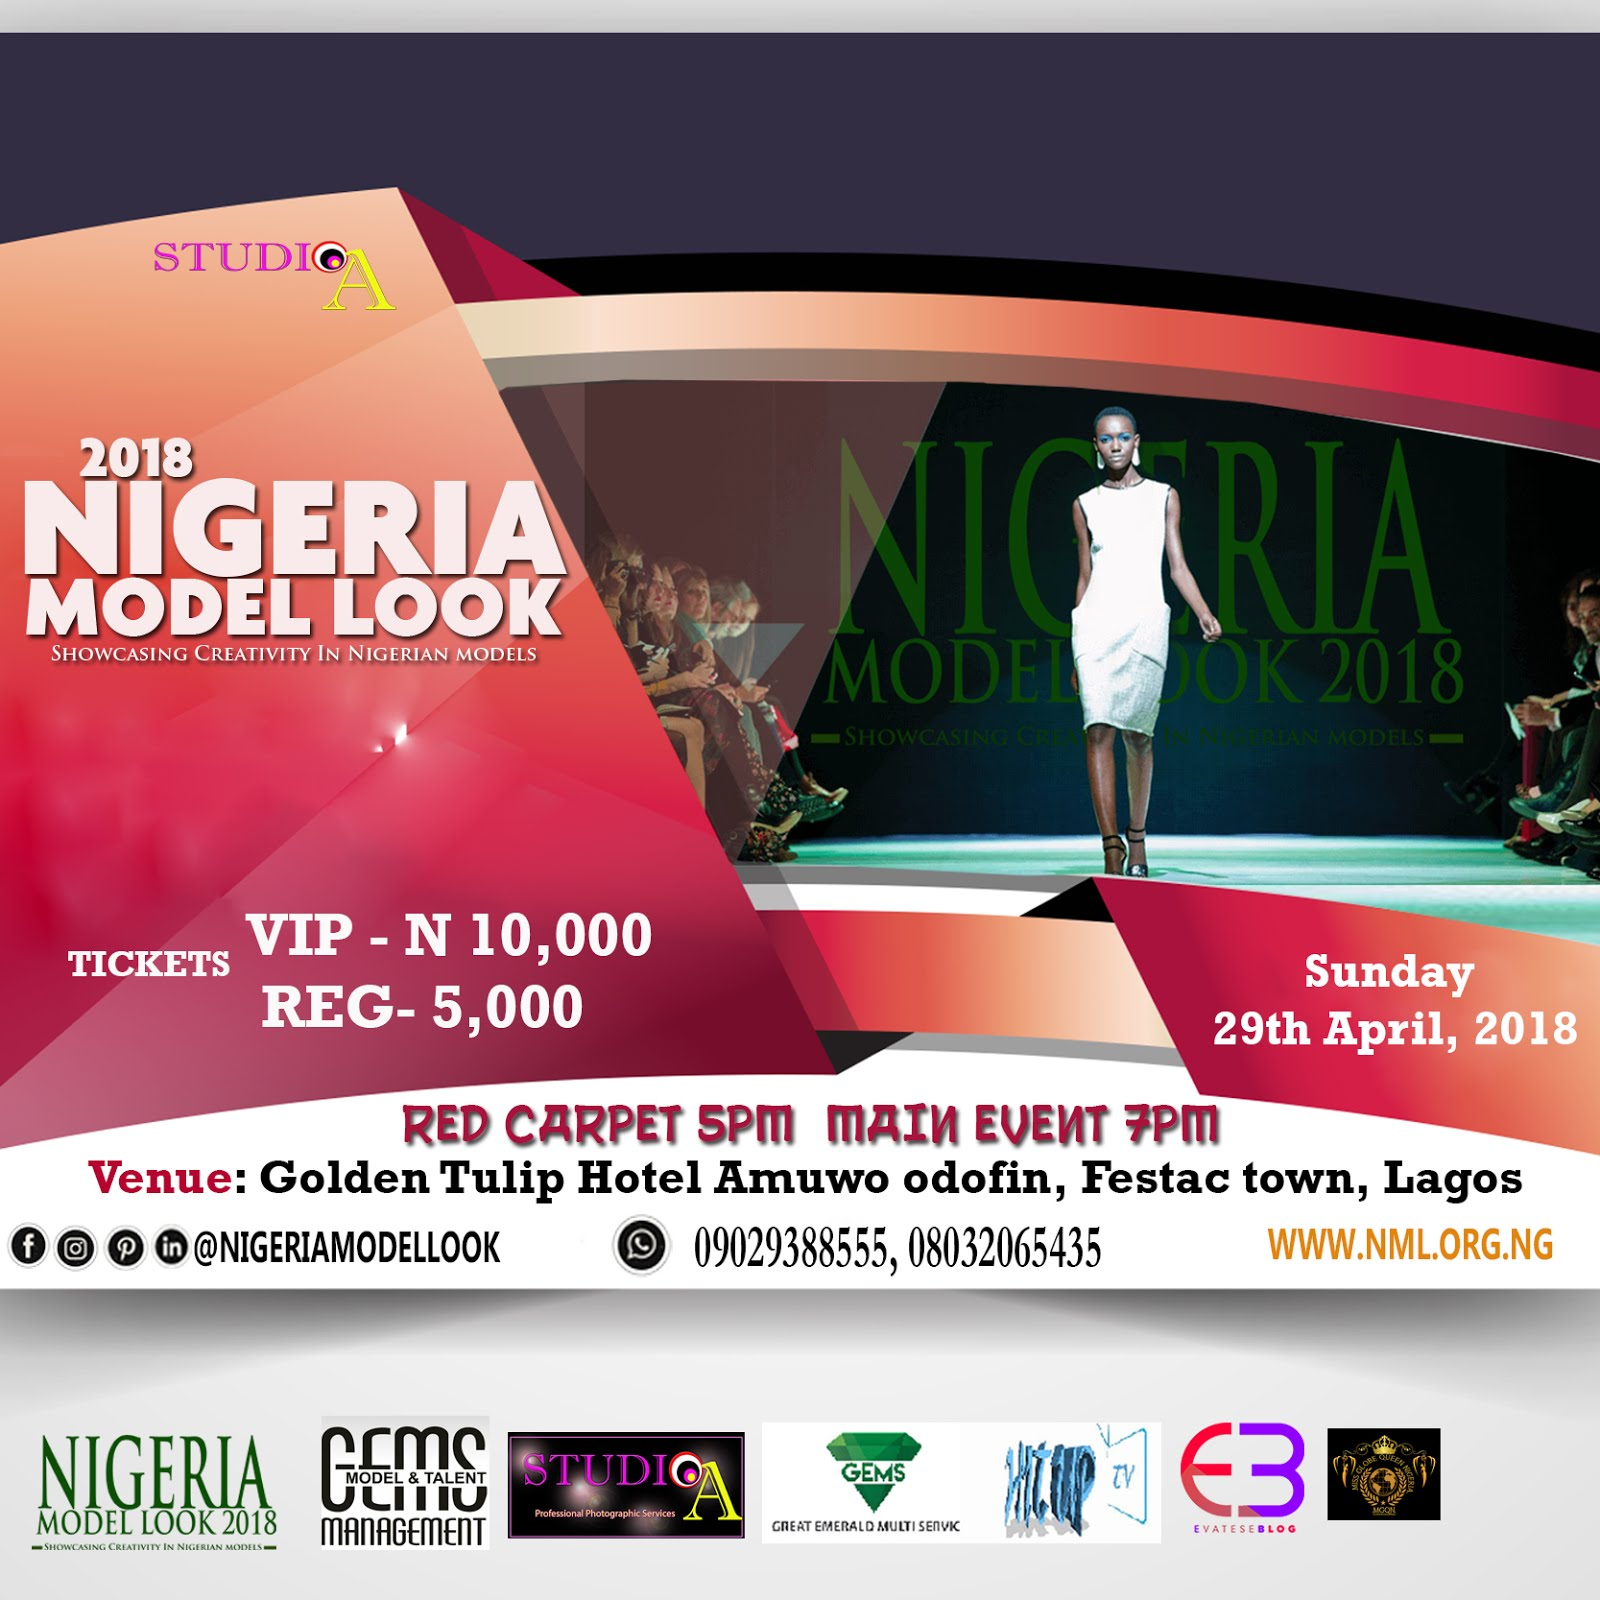 2018 Nigeria Model Look